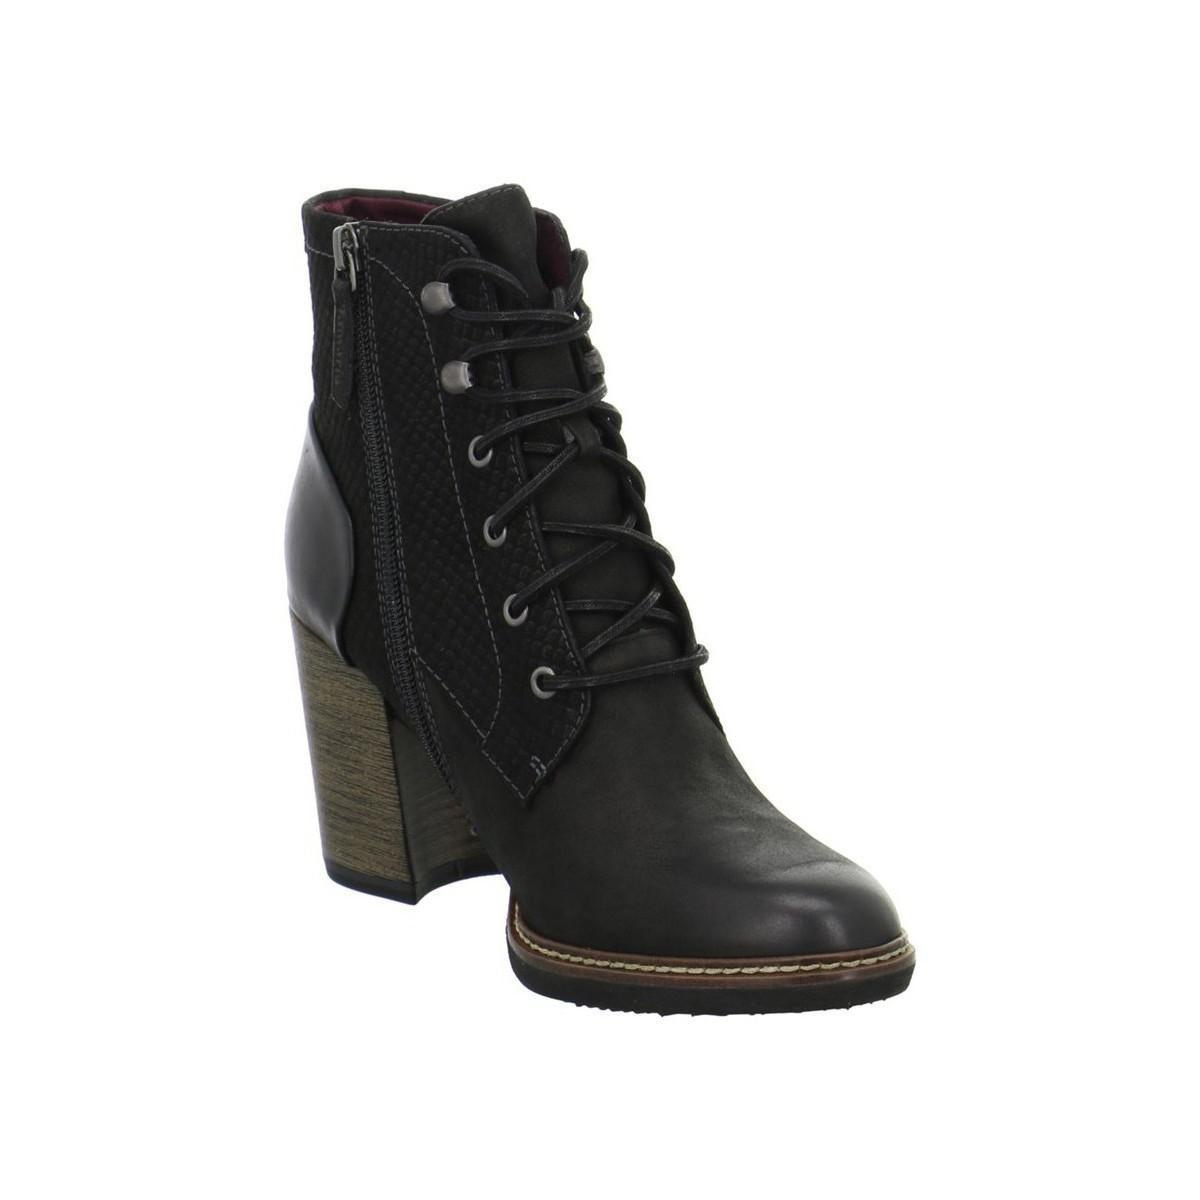 1f452c723c0 Tamaris Joly Women's Low Ankle Boots In Black - Lyst